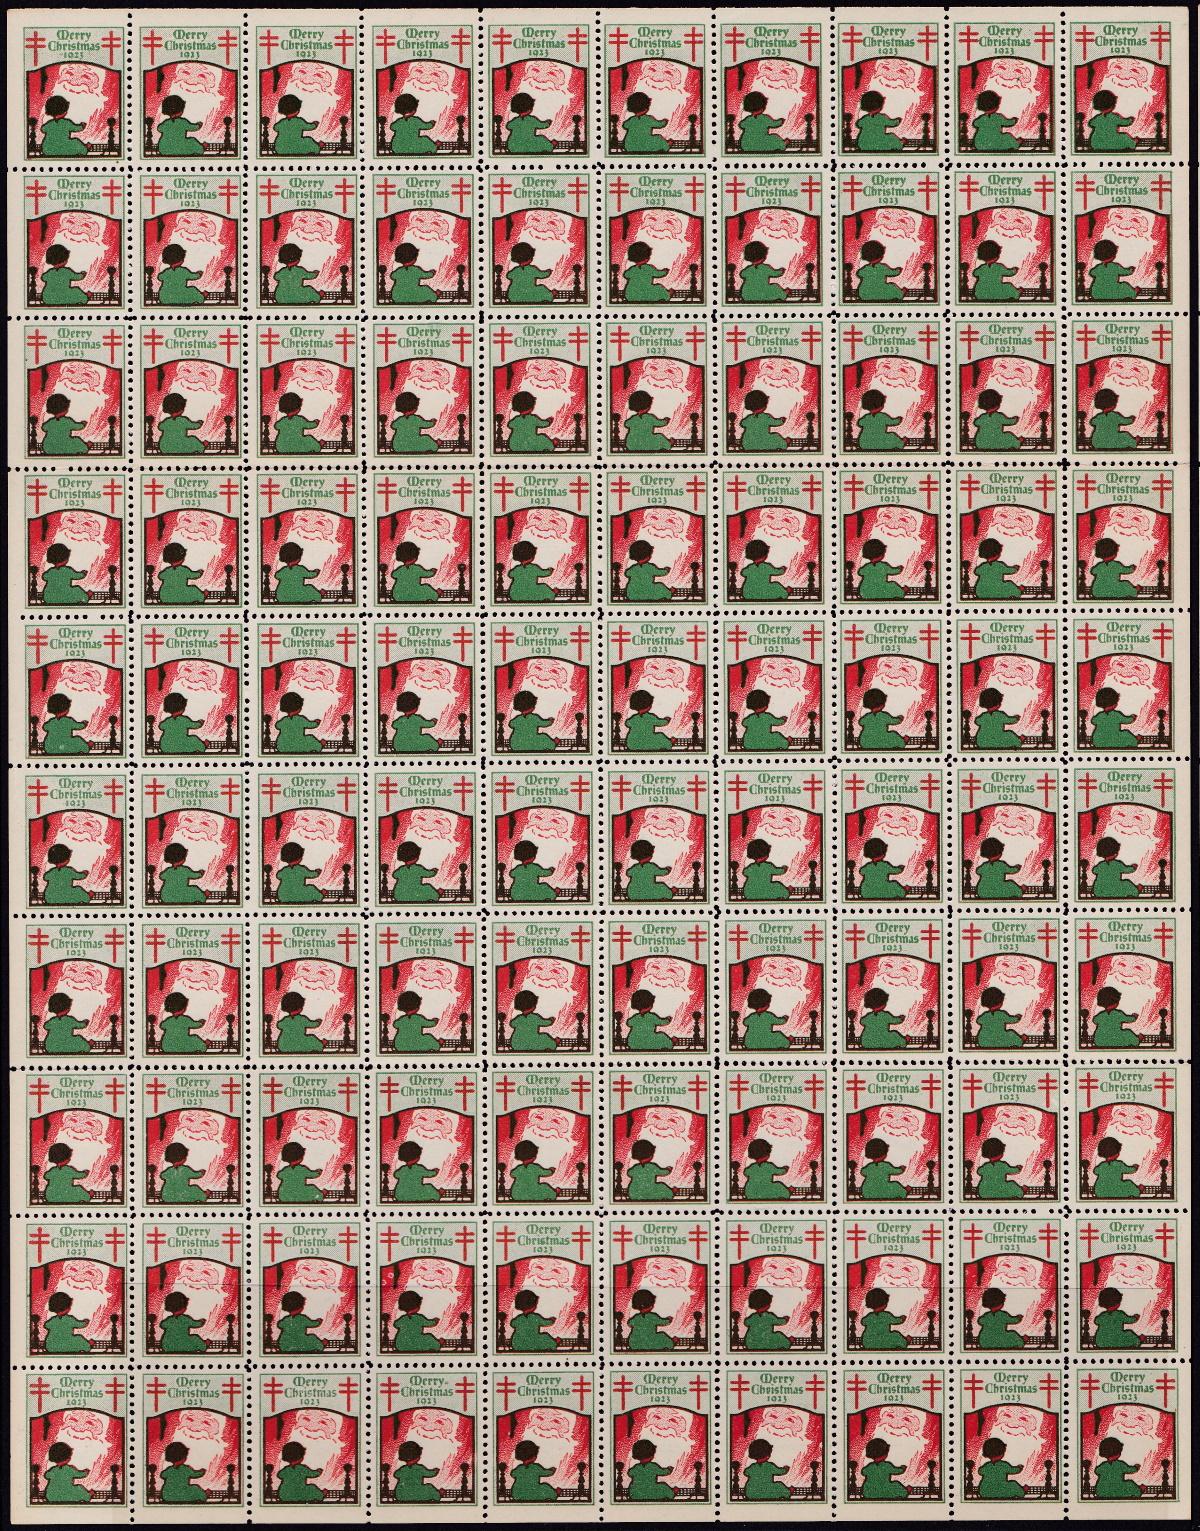 1923 US Christmas Seal Sheet